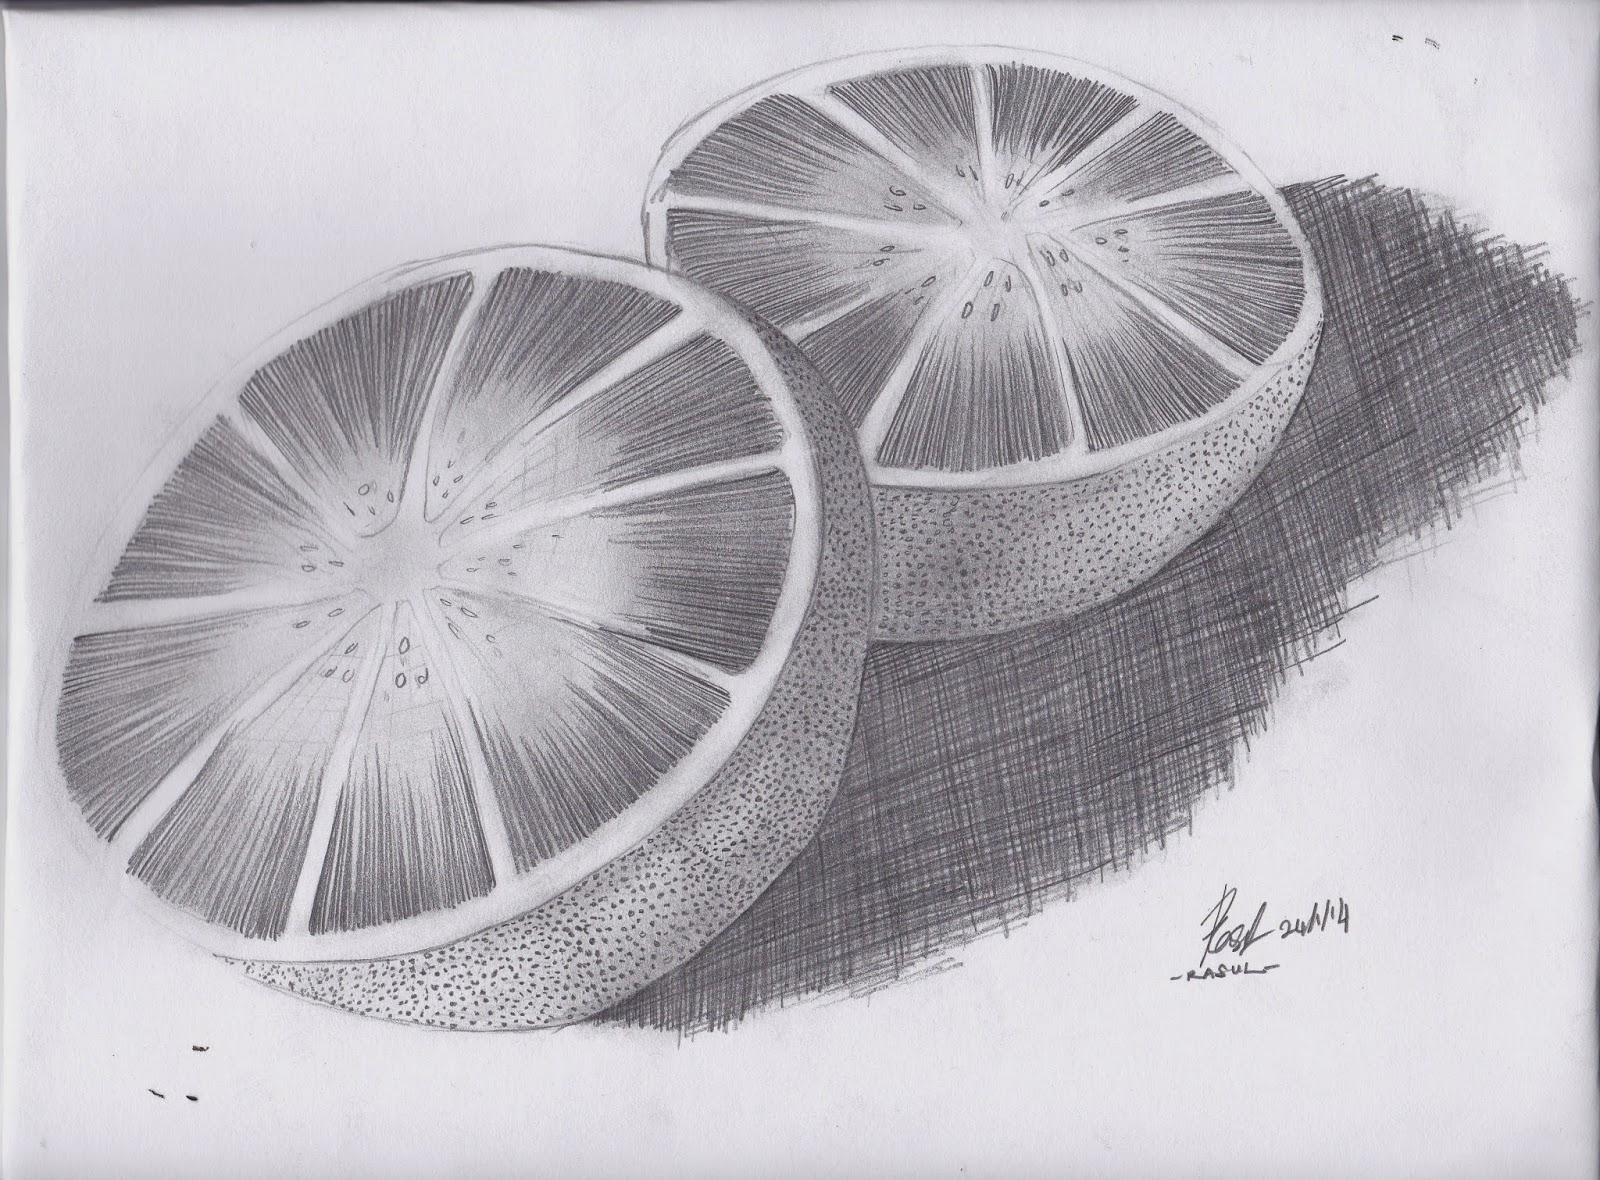 1110180260: Orange fruit